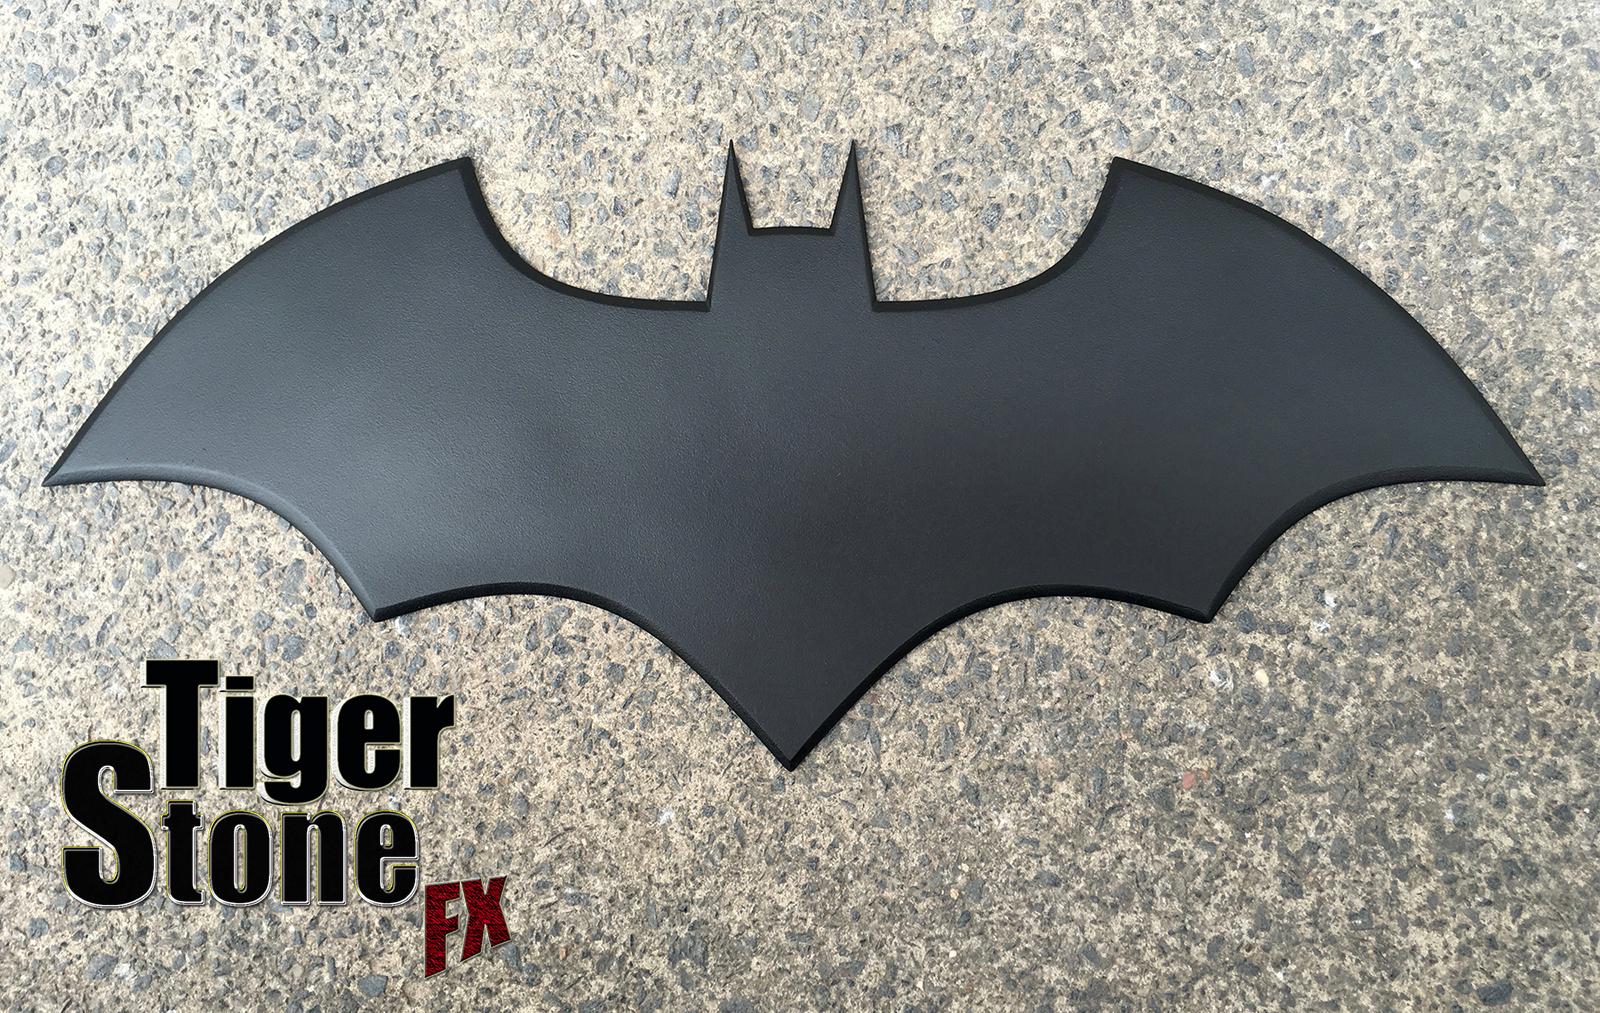 New 52 Batman Inspired Chest Emblem Tiger Stone Fx